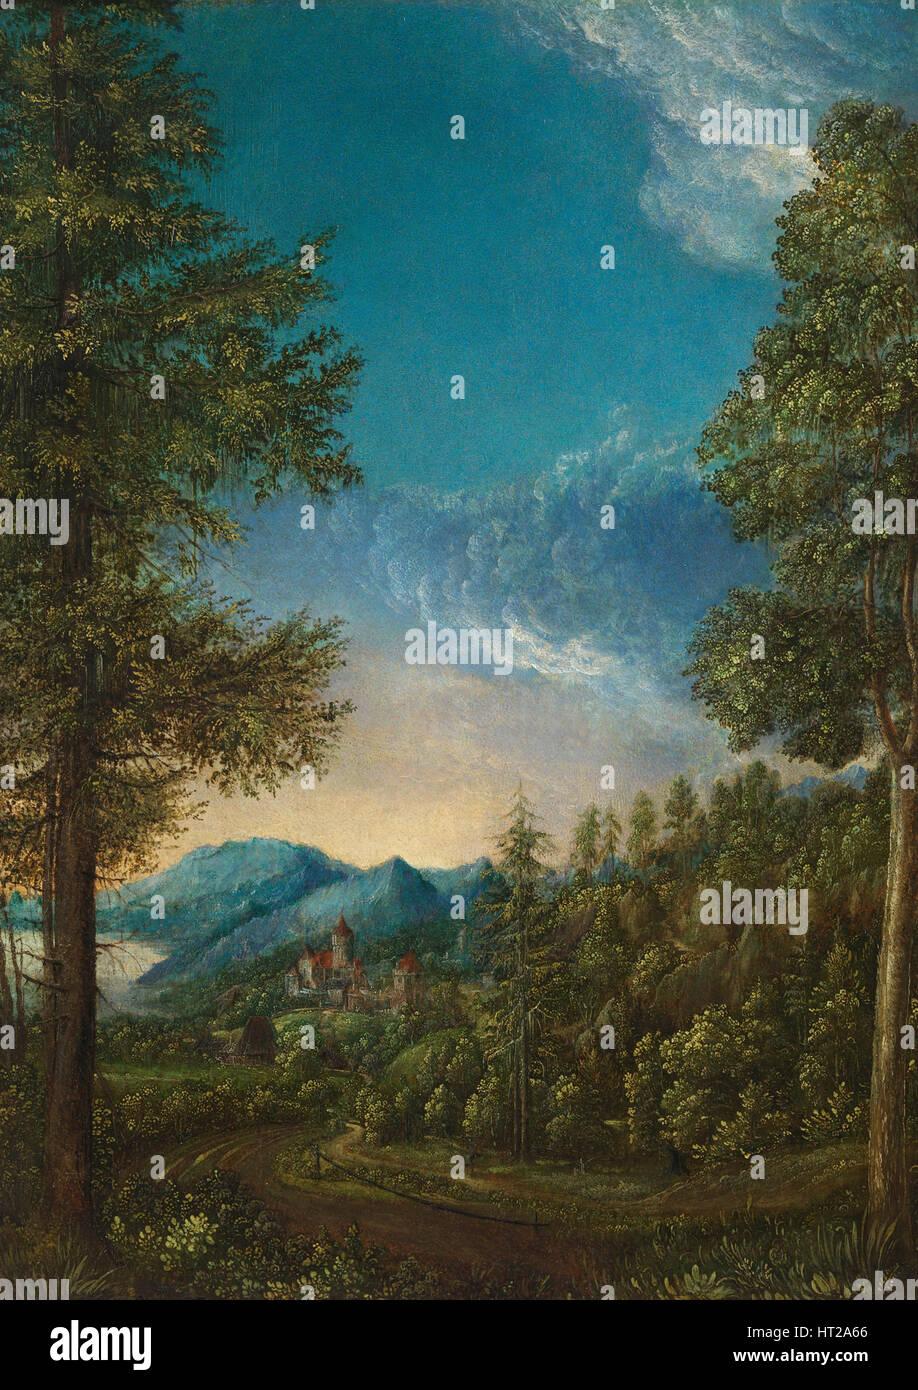 Landschaft mit Burg, c. 1525. Künstler: Altdorfer, Albrecht (c. 1480-1538) Stockbild